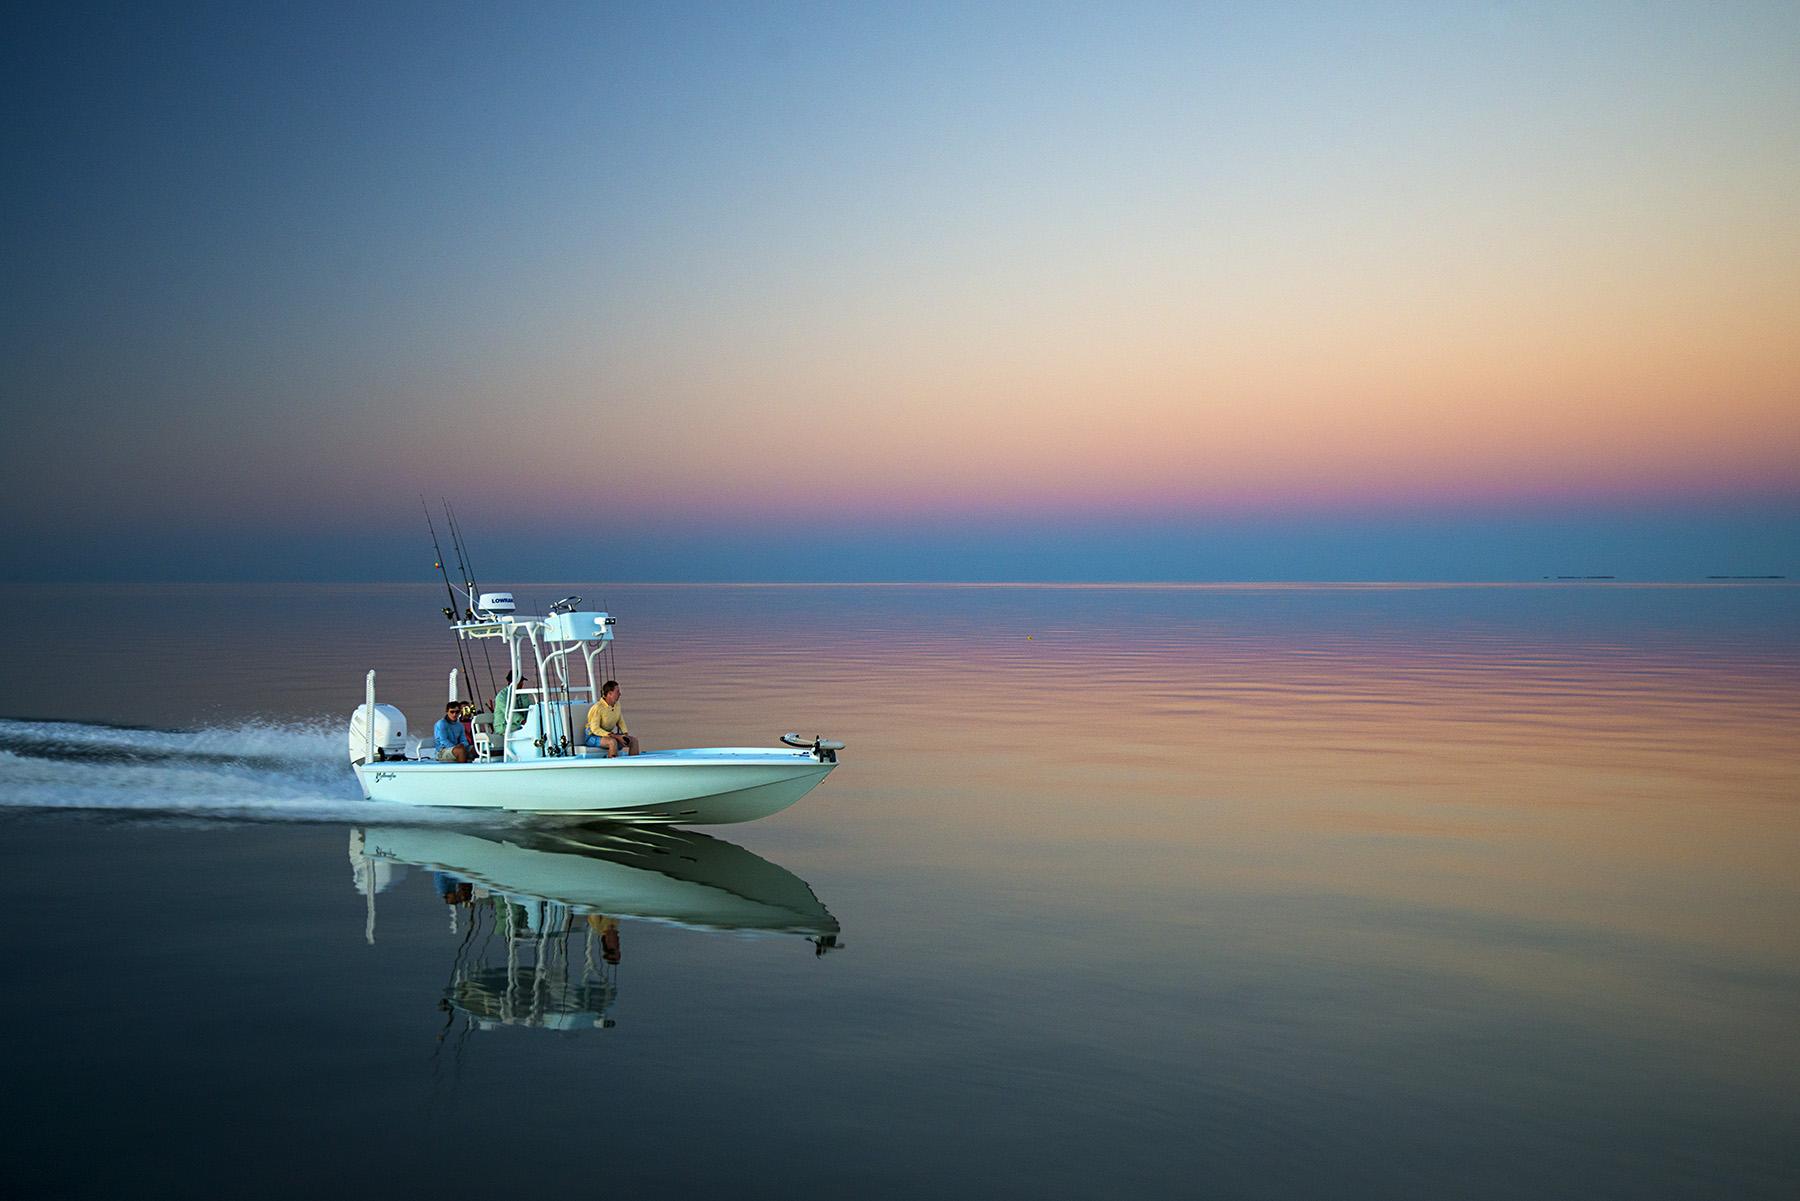 The Yellowfin 24 Bay Boat with Mercury 300 Verado running through Florida Bay at sunset